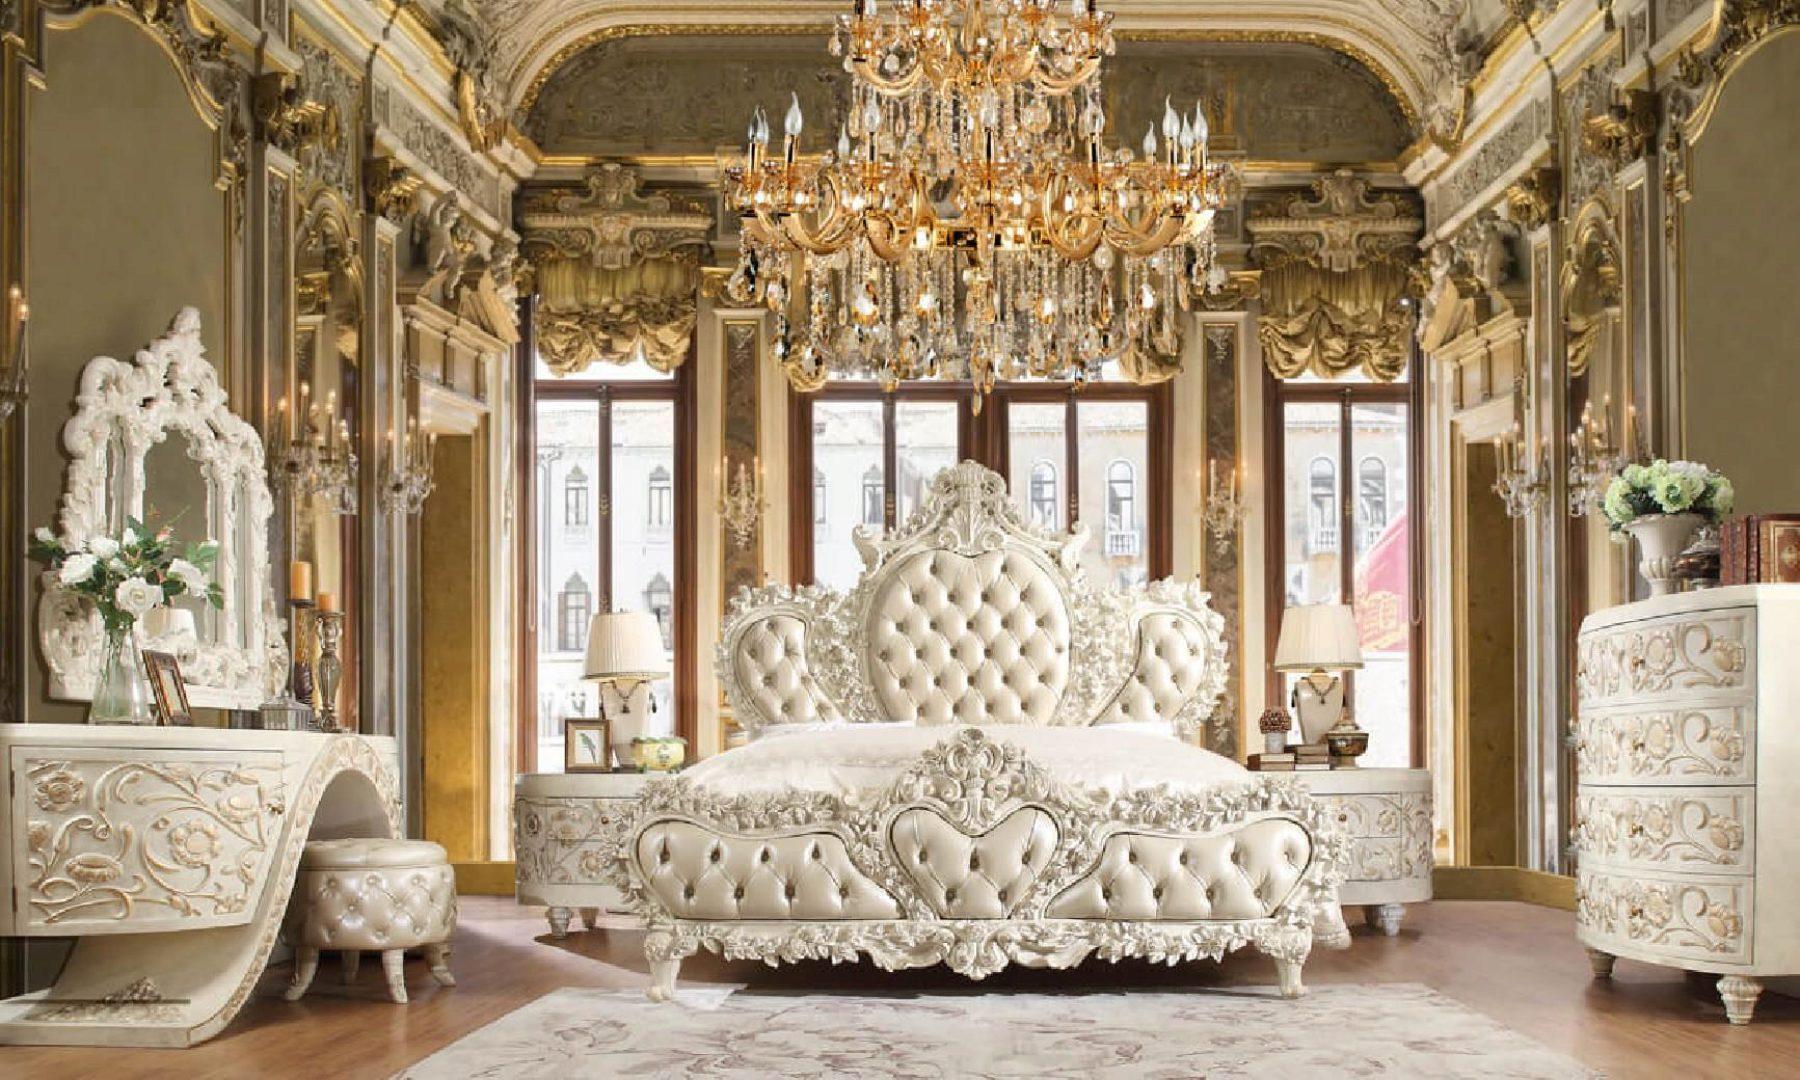 Luxury King Bedroom Set 3 Pcs White Traditional Homey Design Hd 8030 Hd Ek8030 Set 3